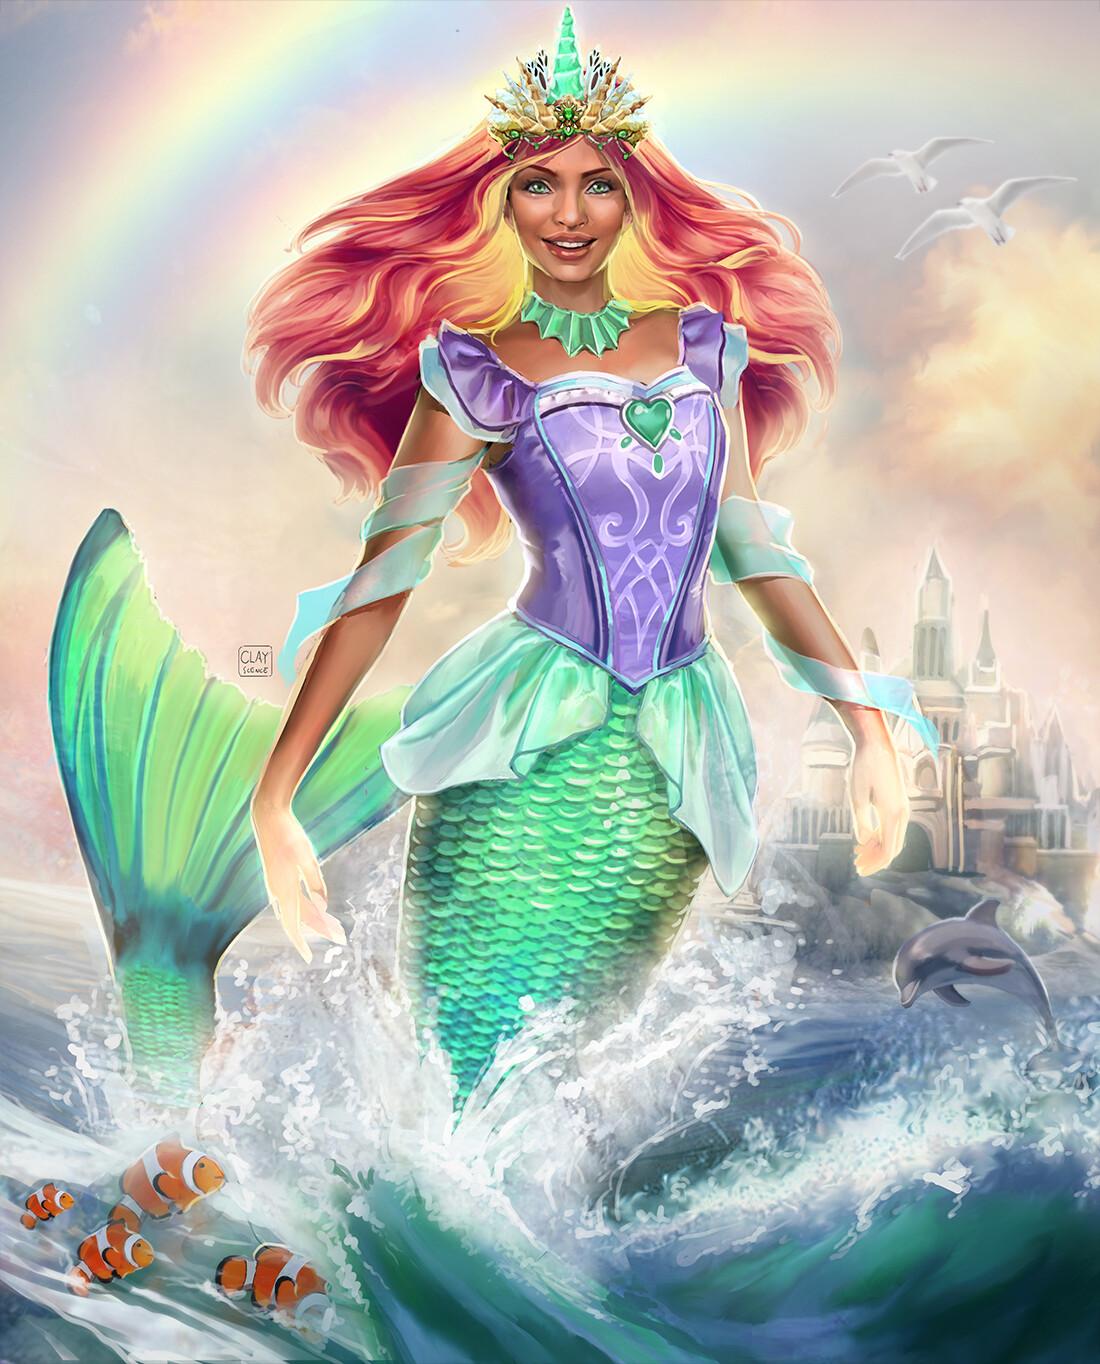 ArtStation - The Little Mermaid, Luke Maddox | Dark